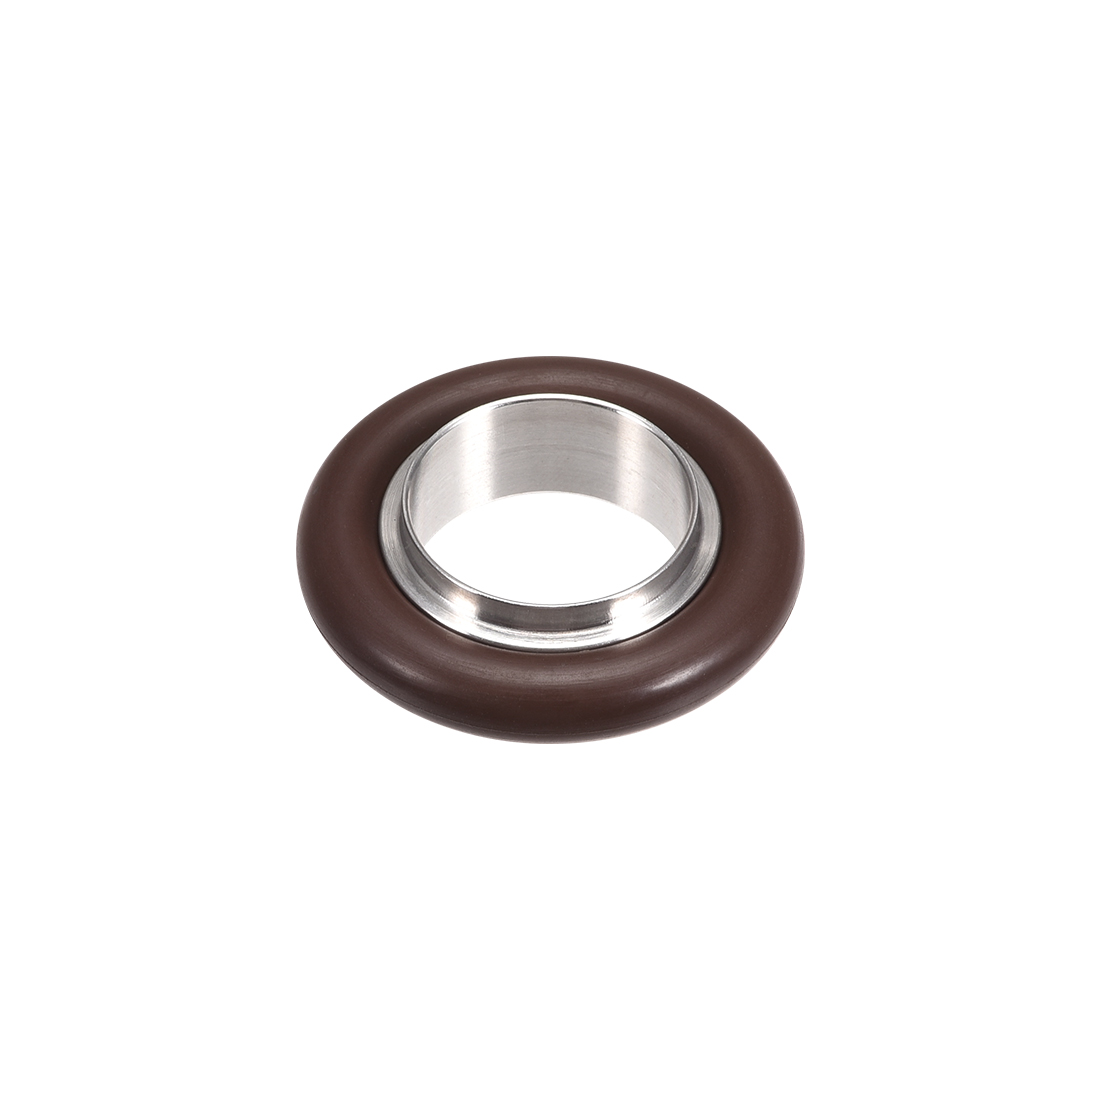 Centering Ring KF-16 Vacuum Fittings ISO-KF Flange 29mm x 16mm